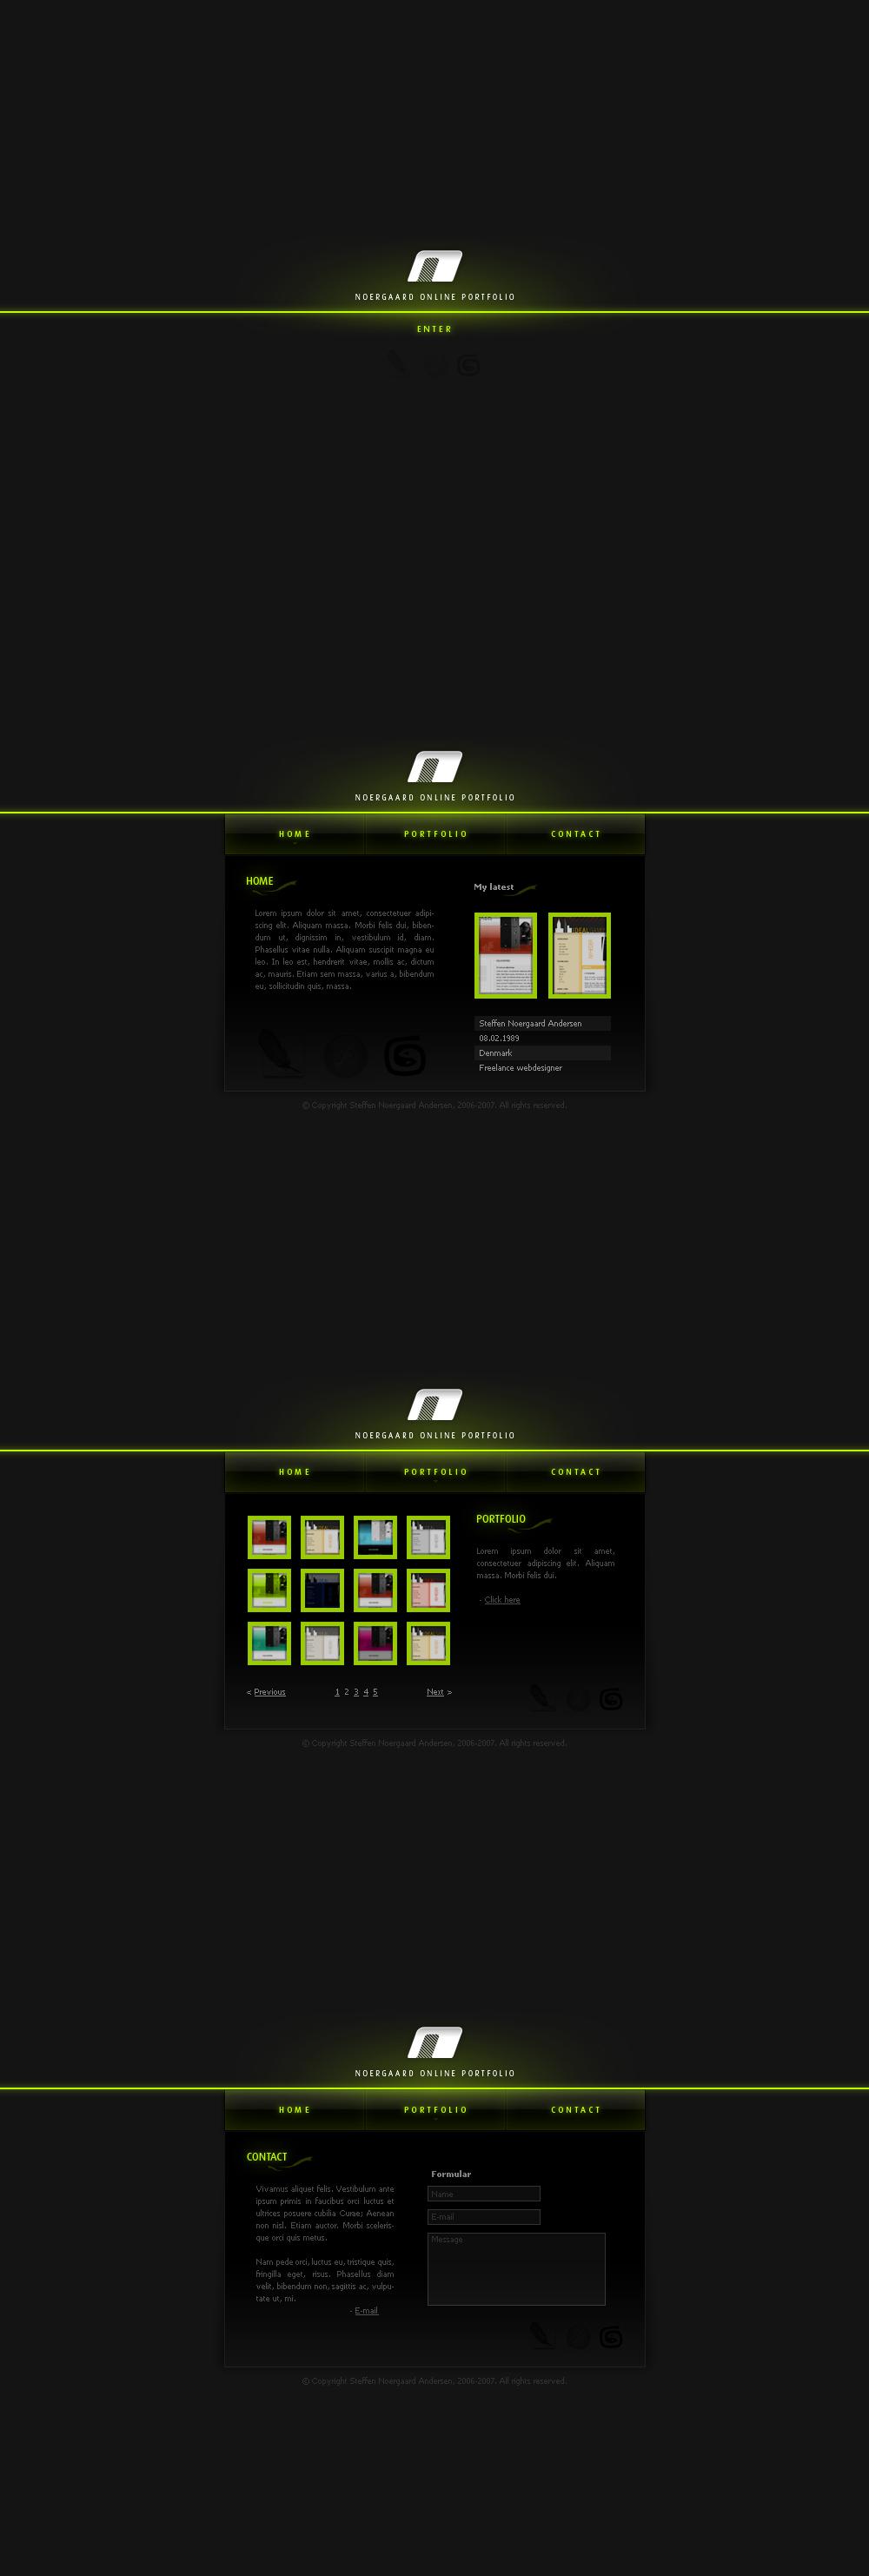 Im-borred - Webdesign by Noergaard